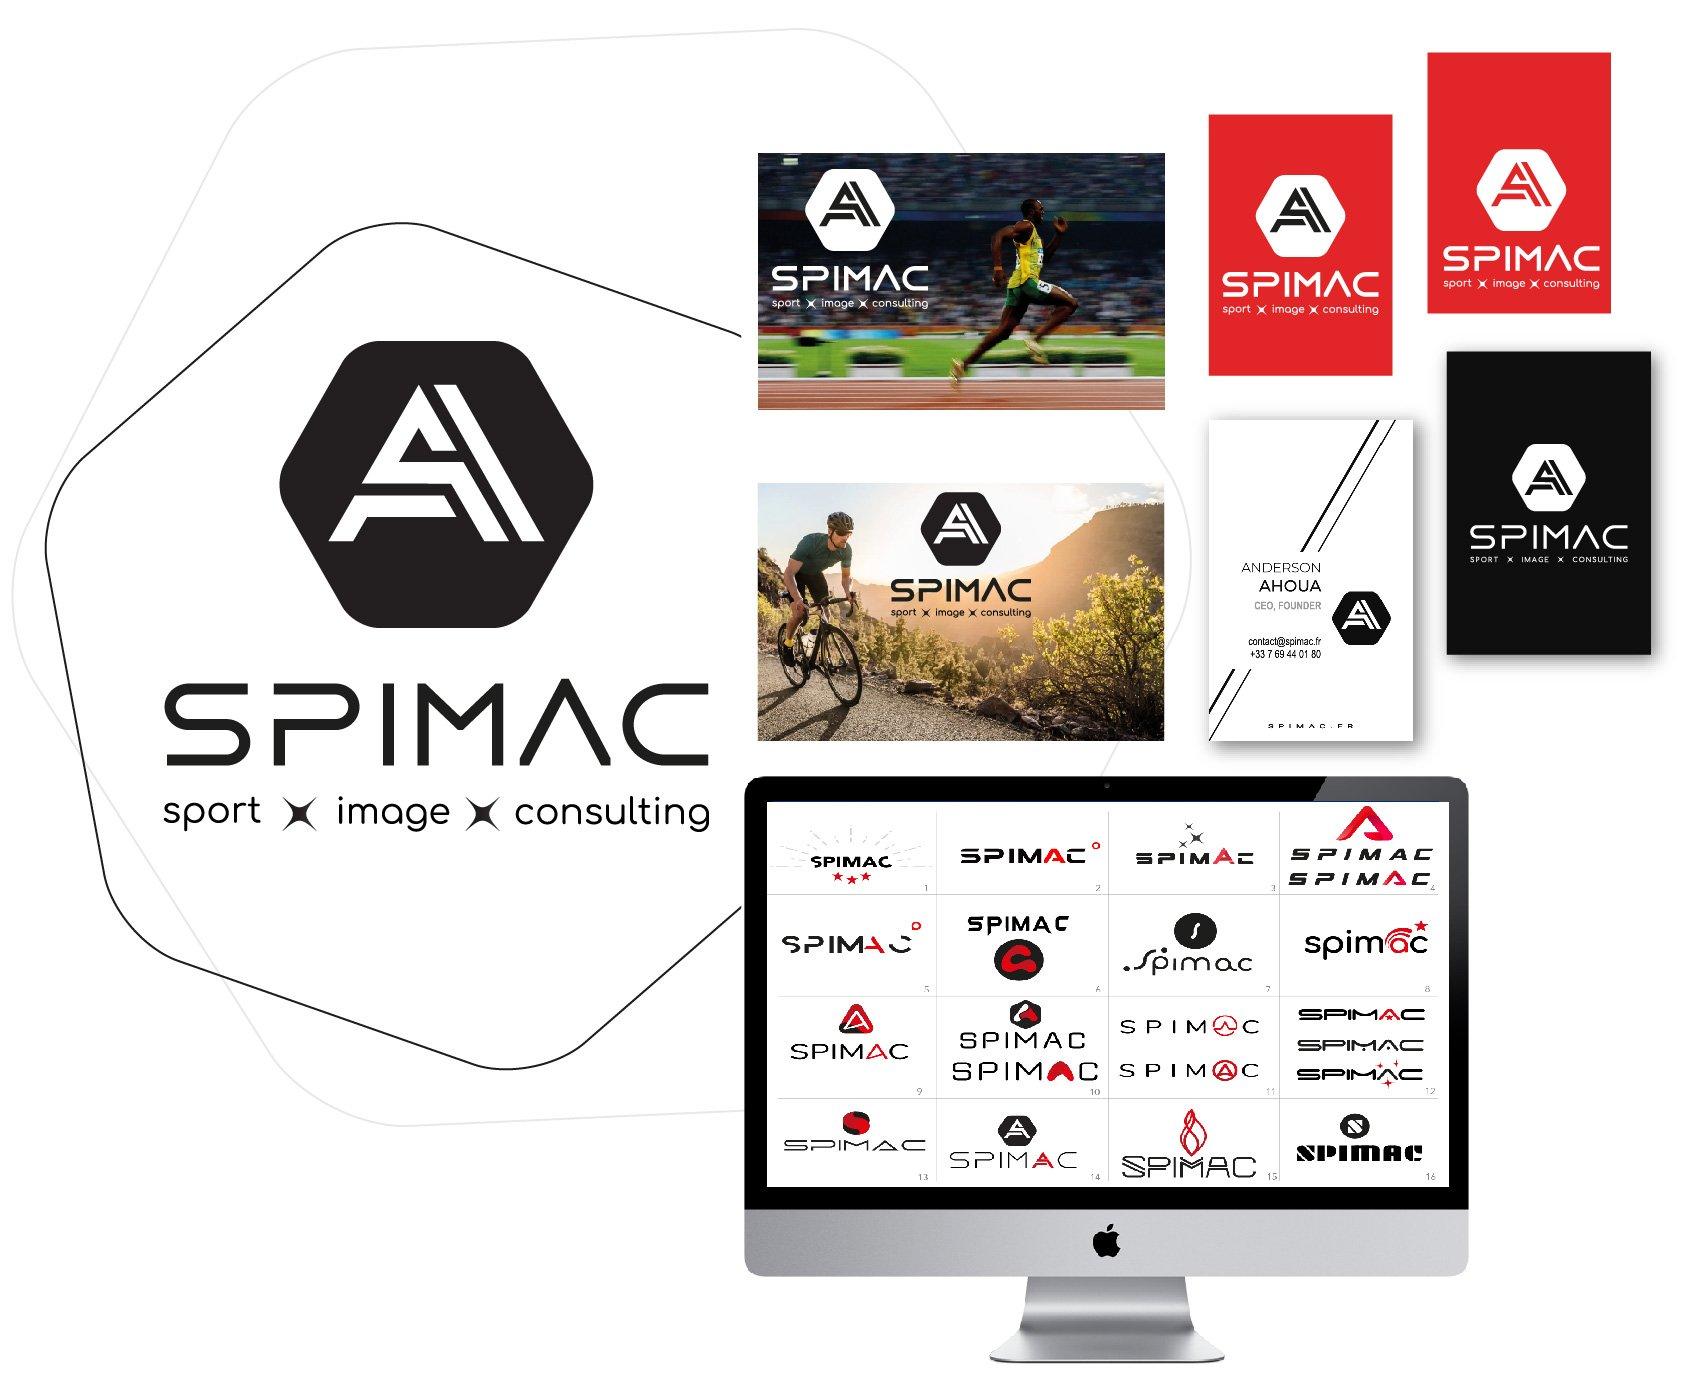 Spimac - Identite visuelle